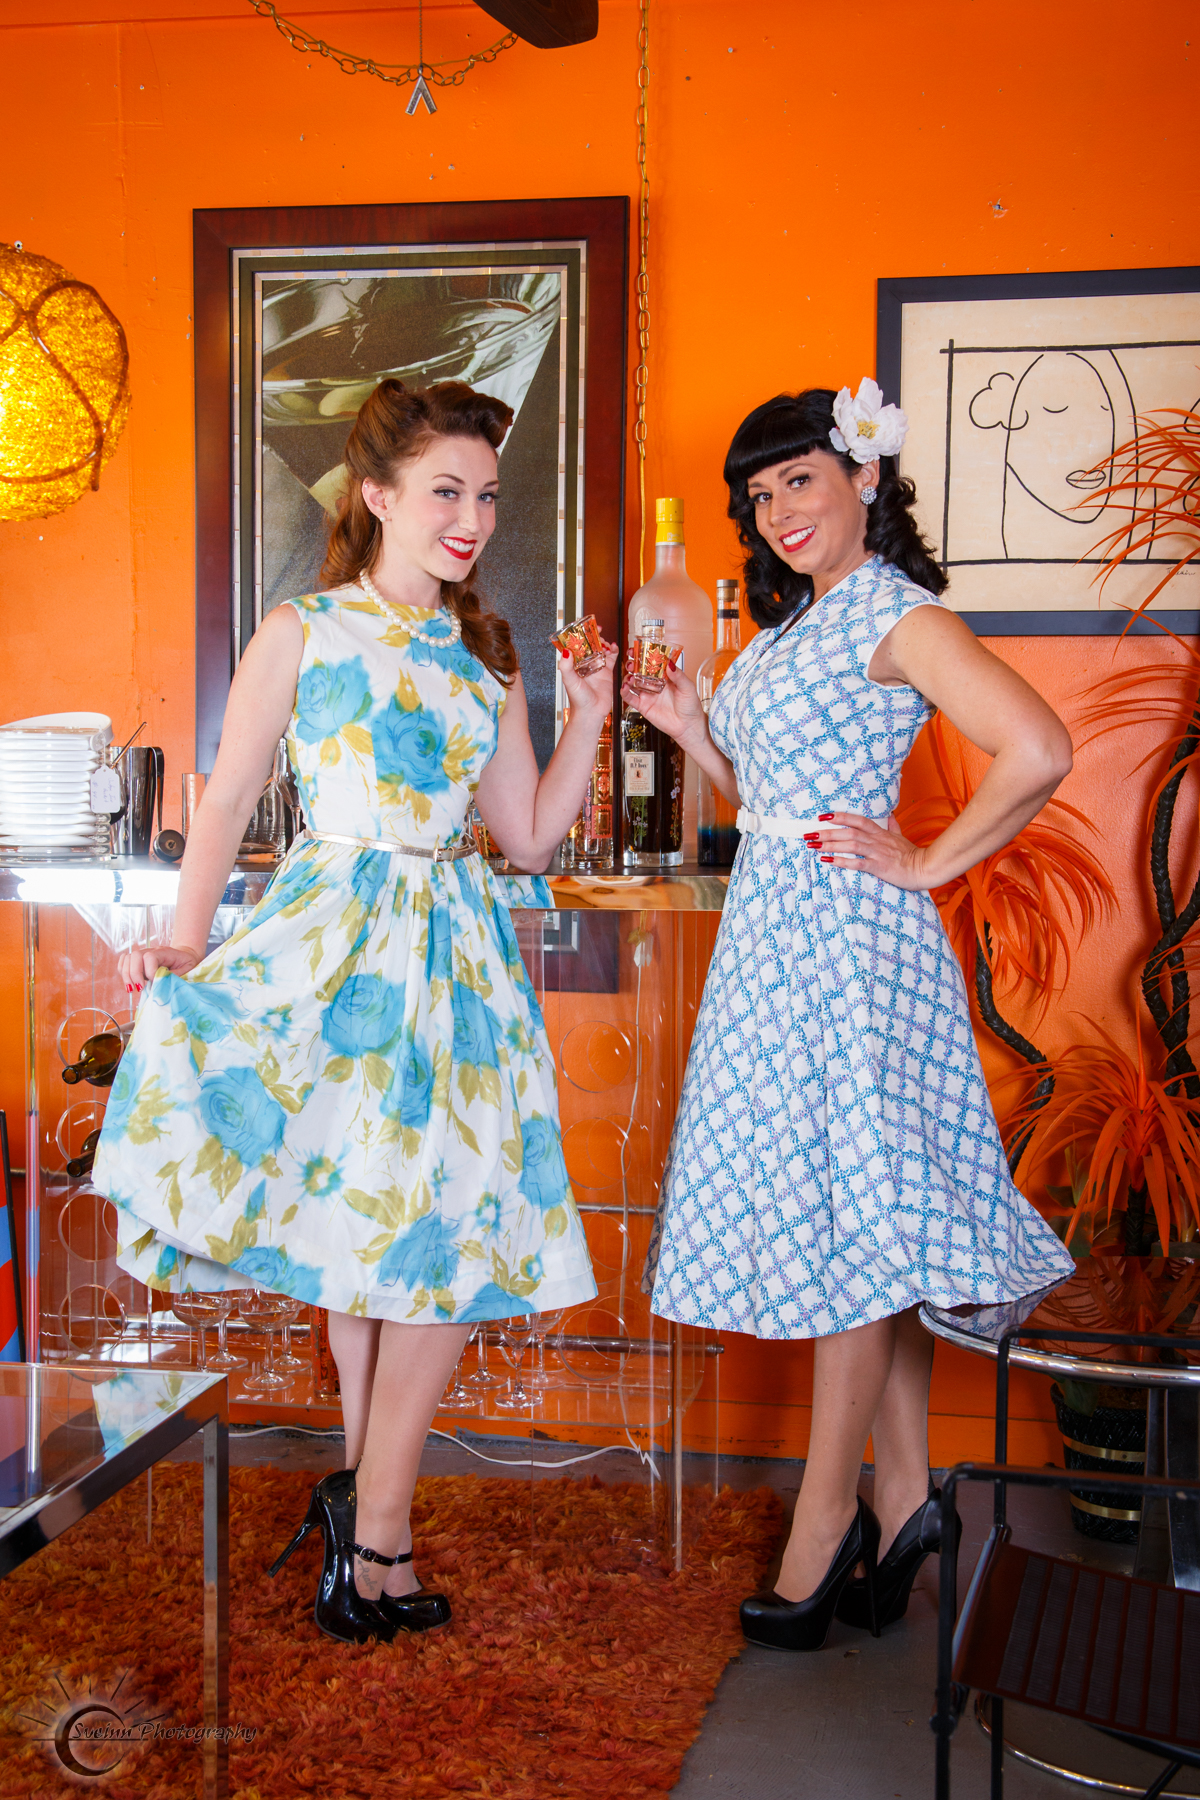 1618 Something Different    1618 N Orange Ave, Orlando, FL 32804  (407) 897-6707   http://www.somethingdifferentretro.com